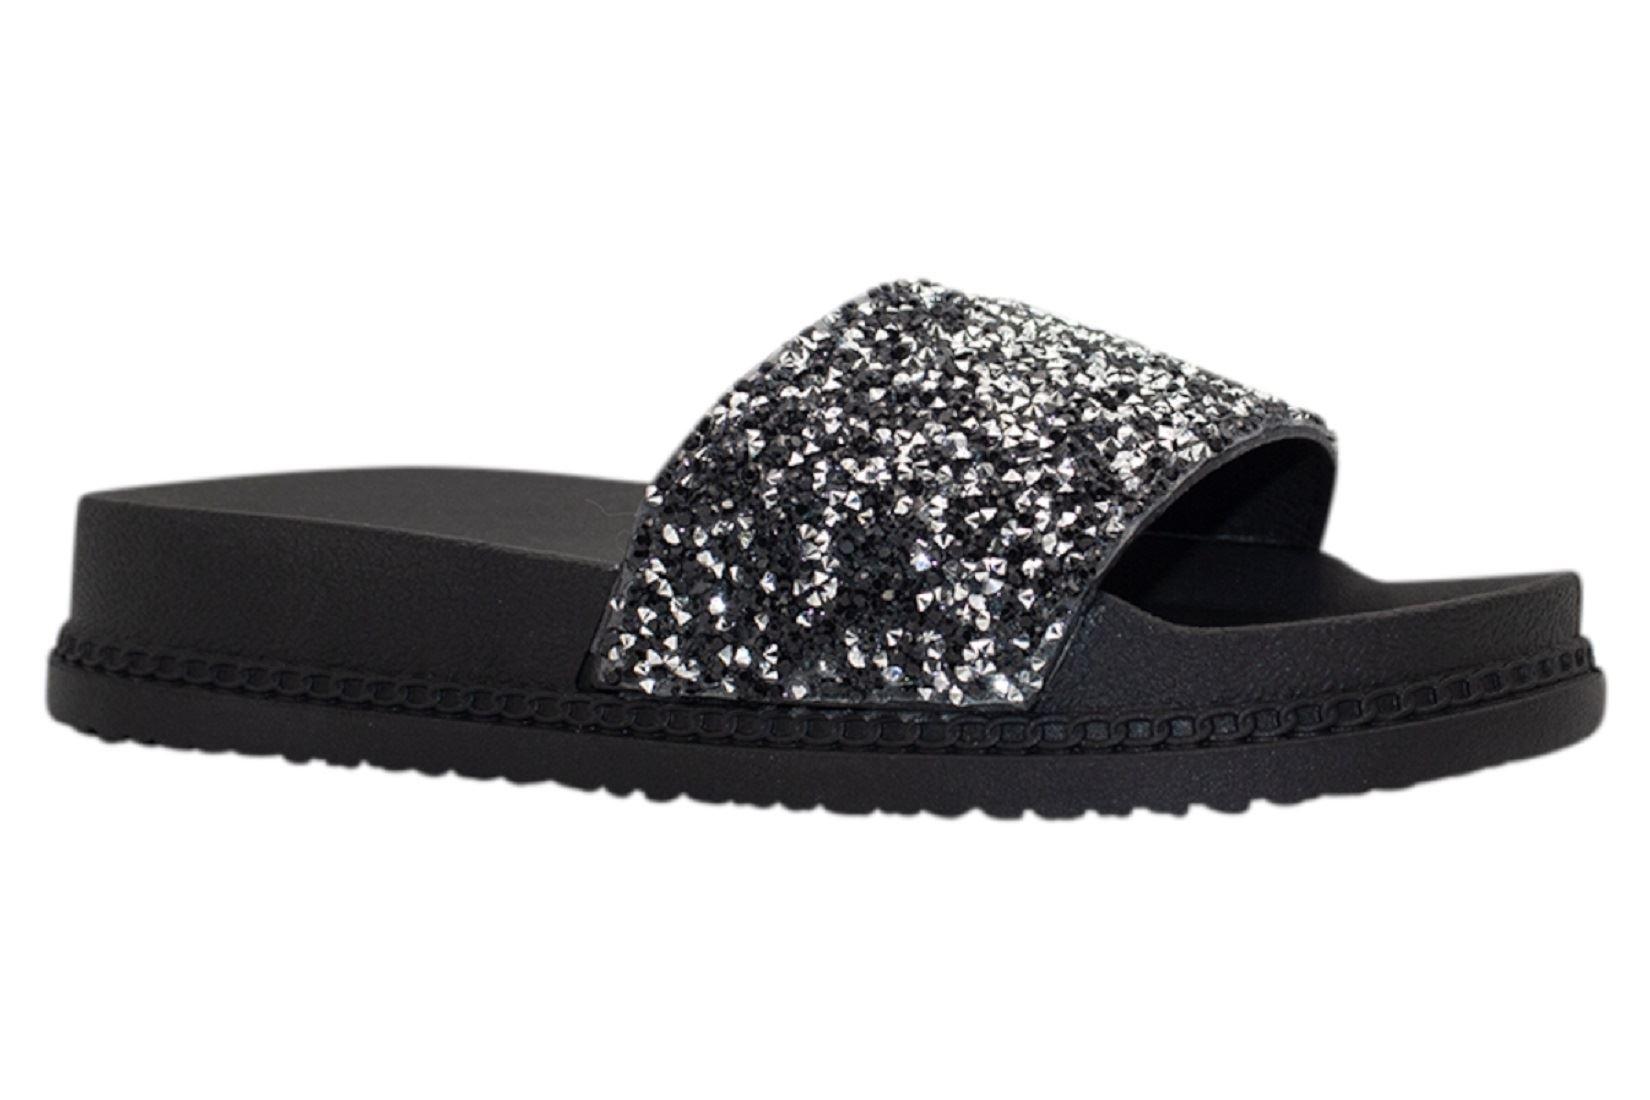 Womens-Sliders-Casual-Slippers-Mules-Ladies-Diamante-Flip-Flop-Sandals-Shoes thumbnail 64